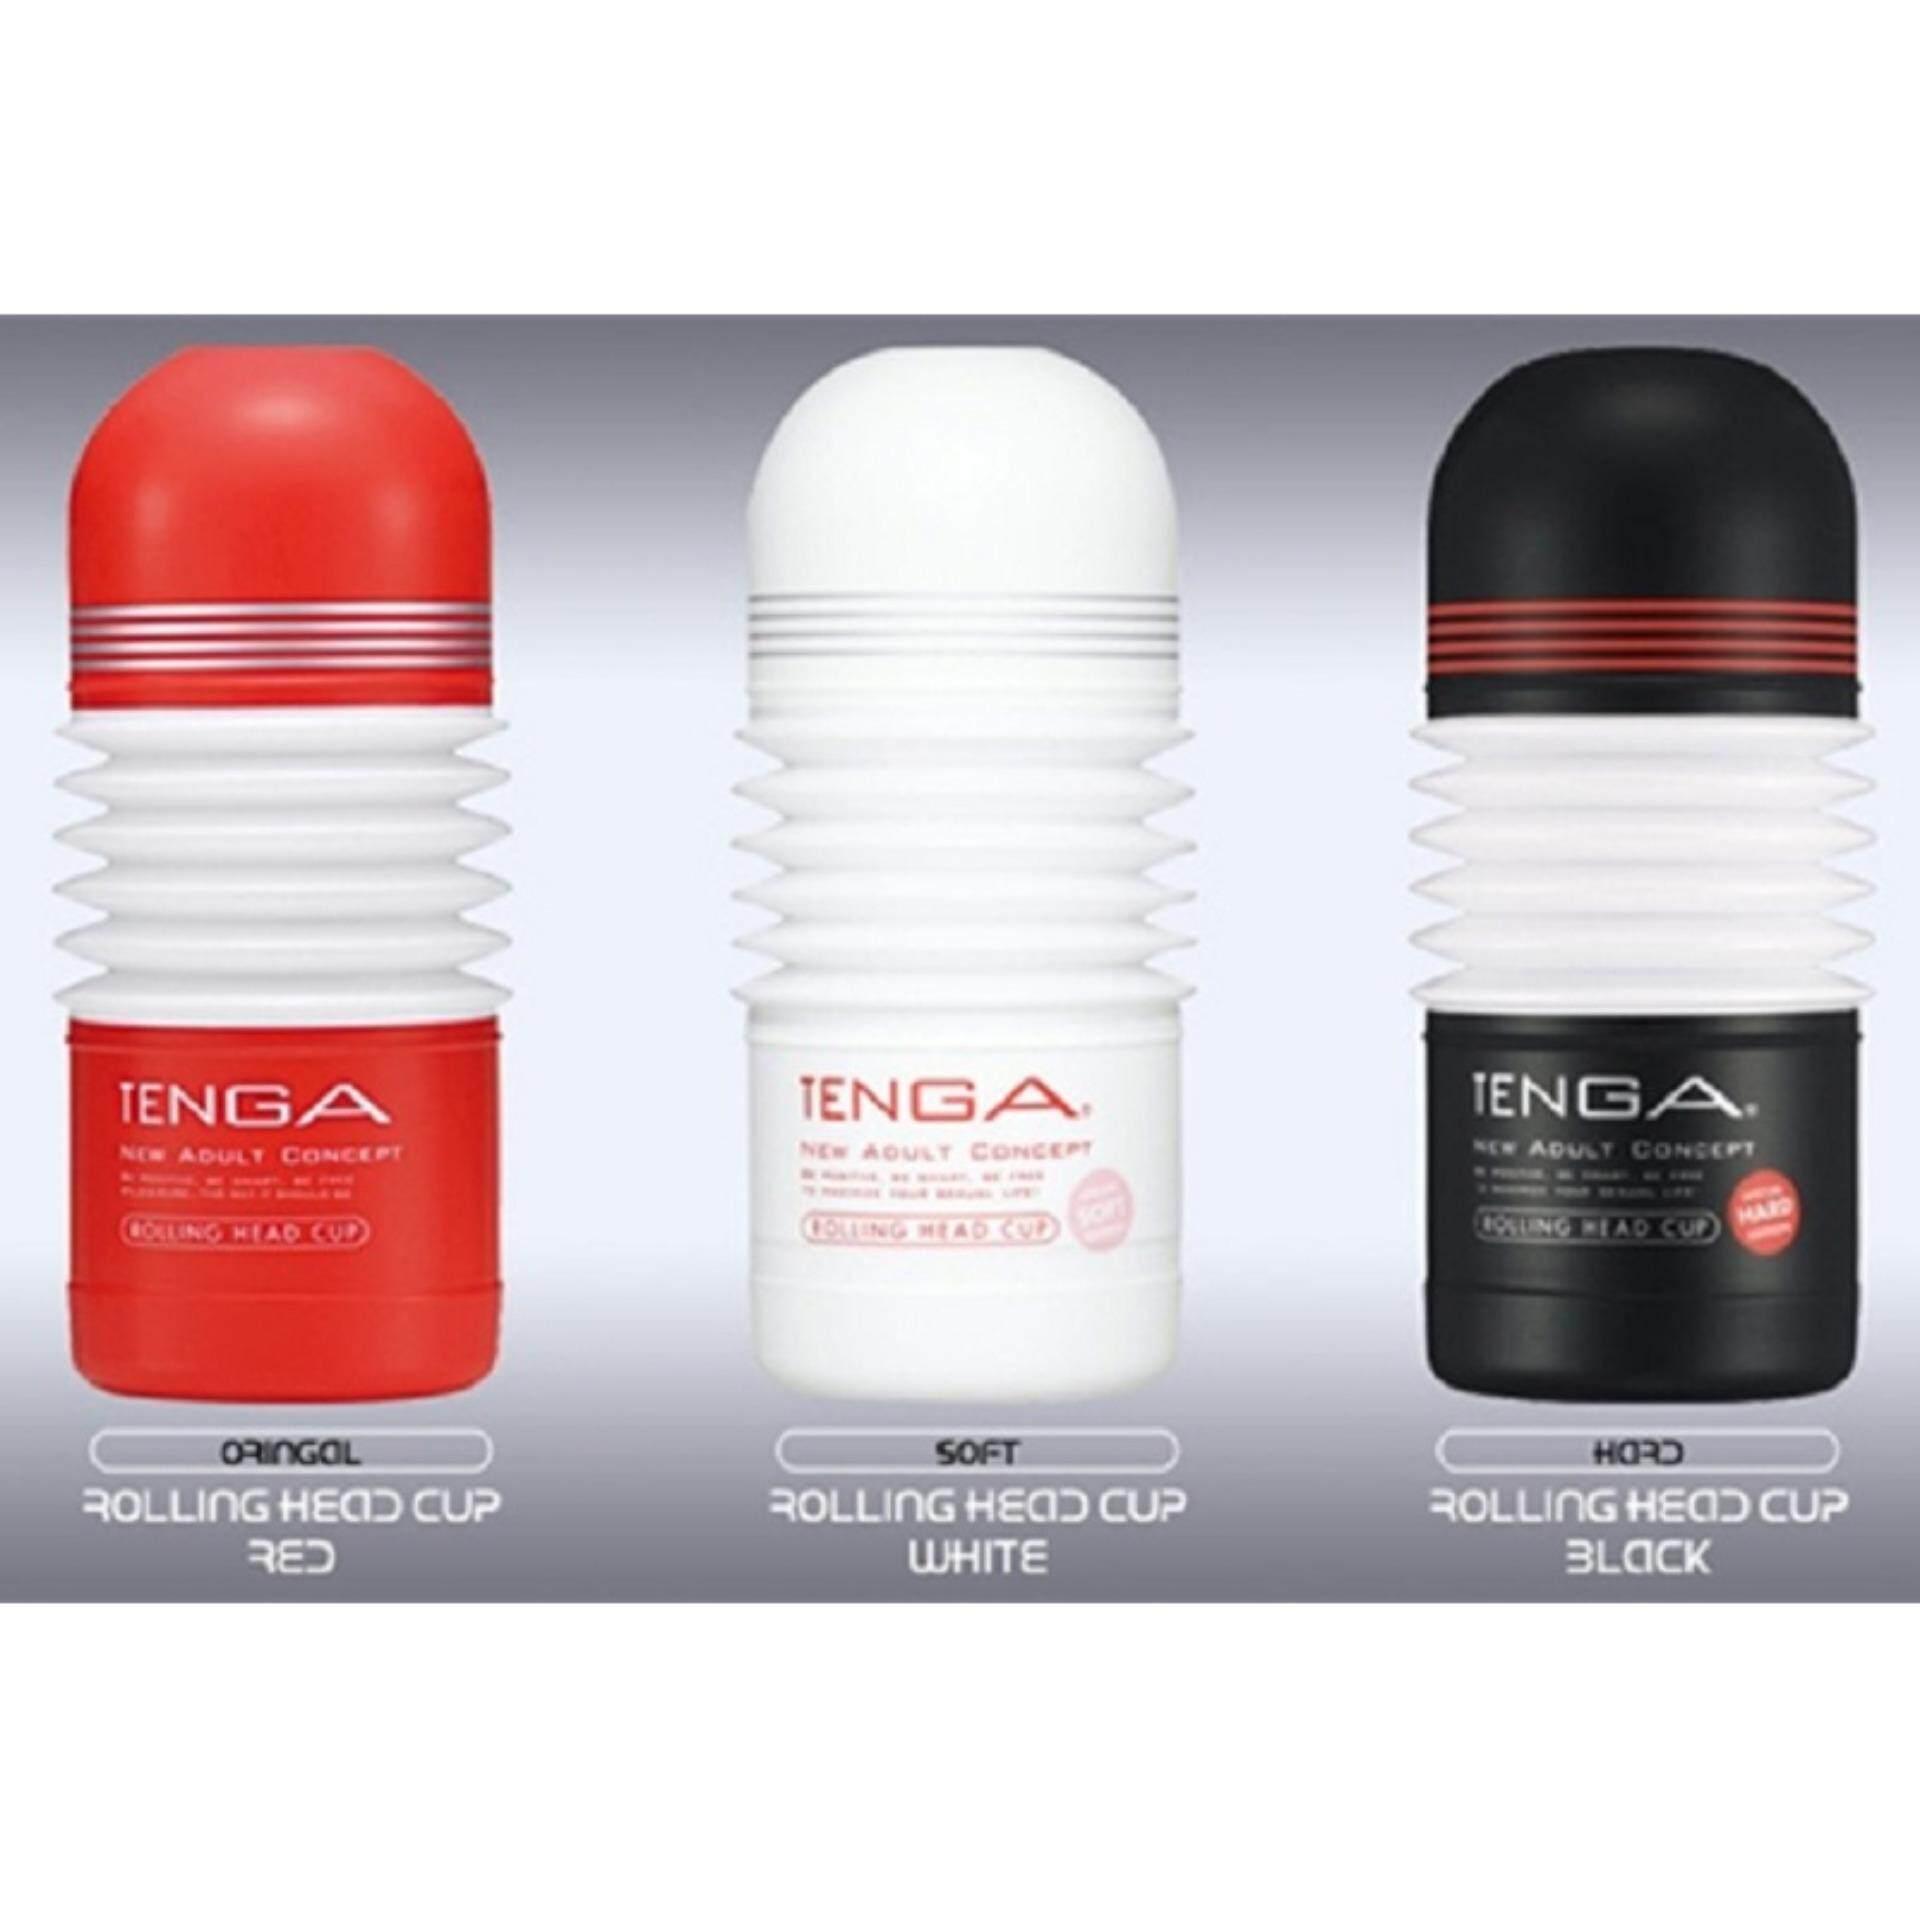 100% Japans Original Tenga Rolling Cup Reuseable Mastubator Toys -SOFT EDITION- Warehouse Clearance Sale